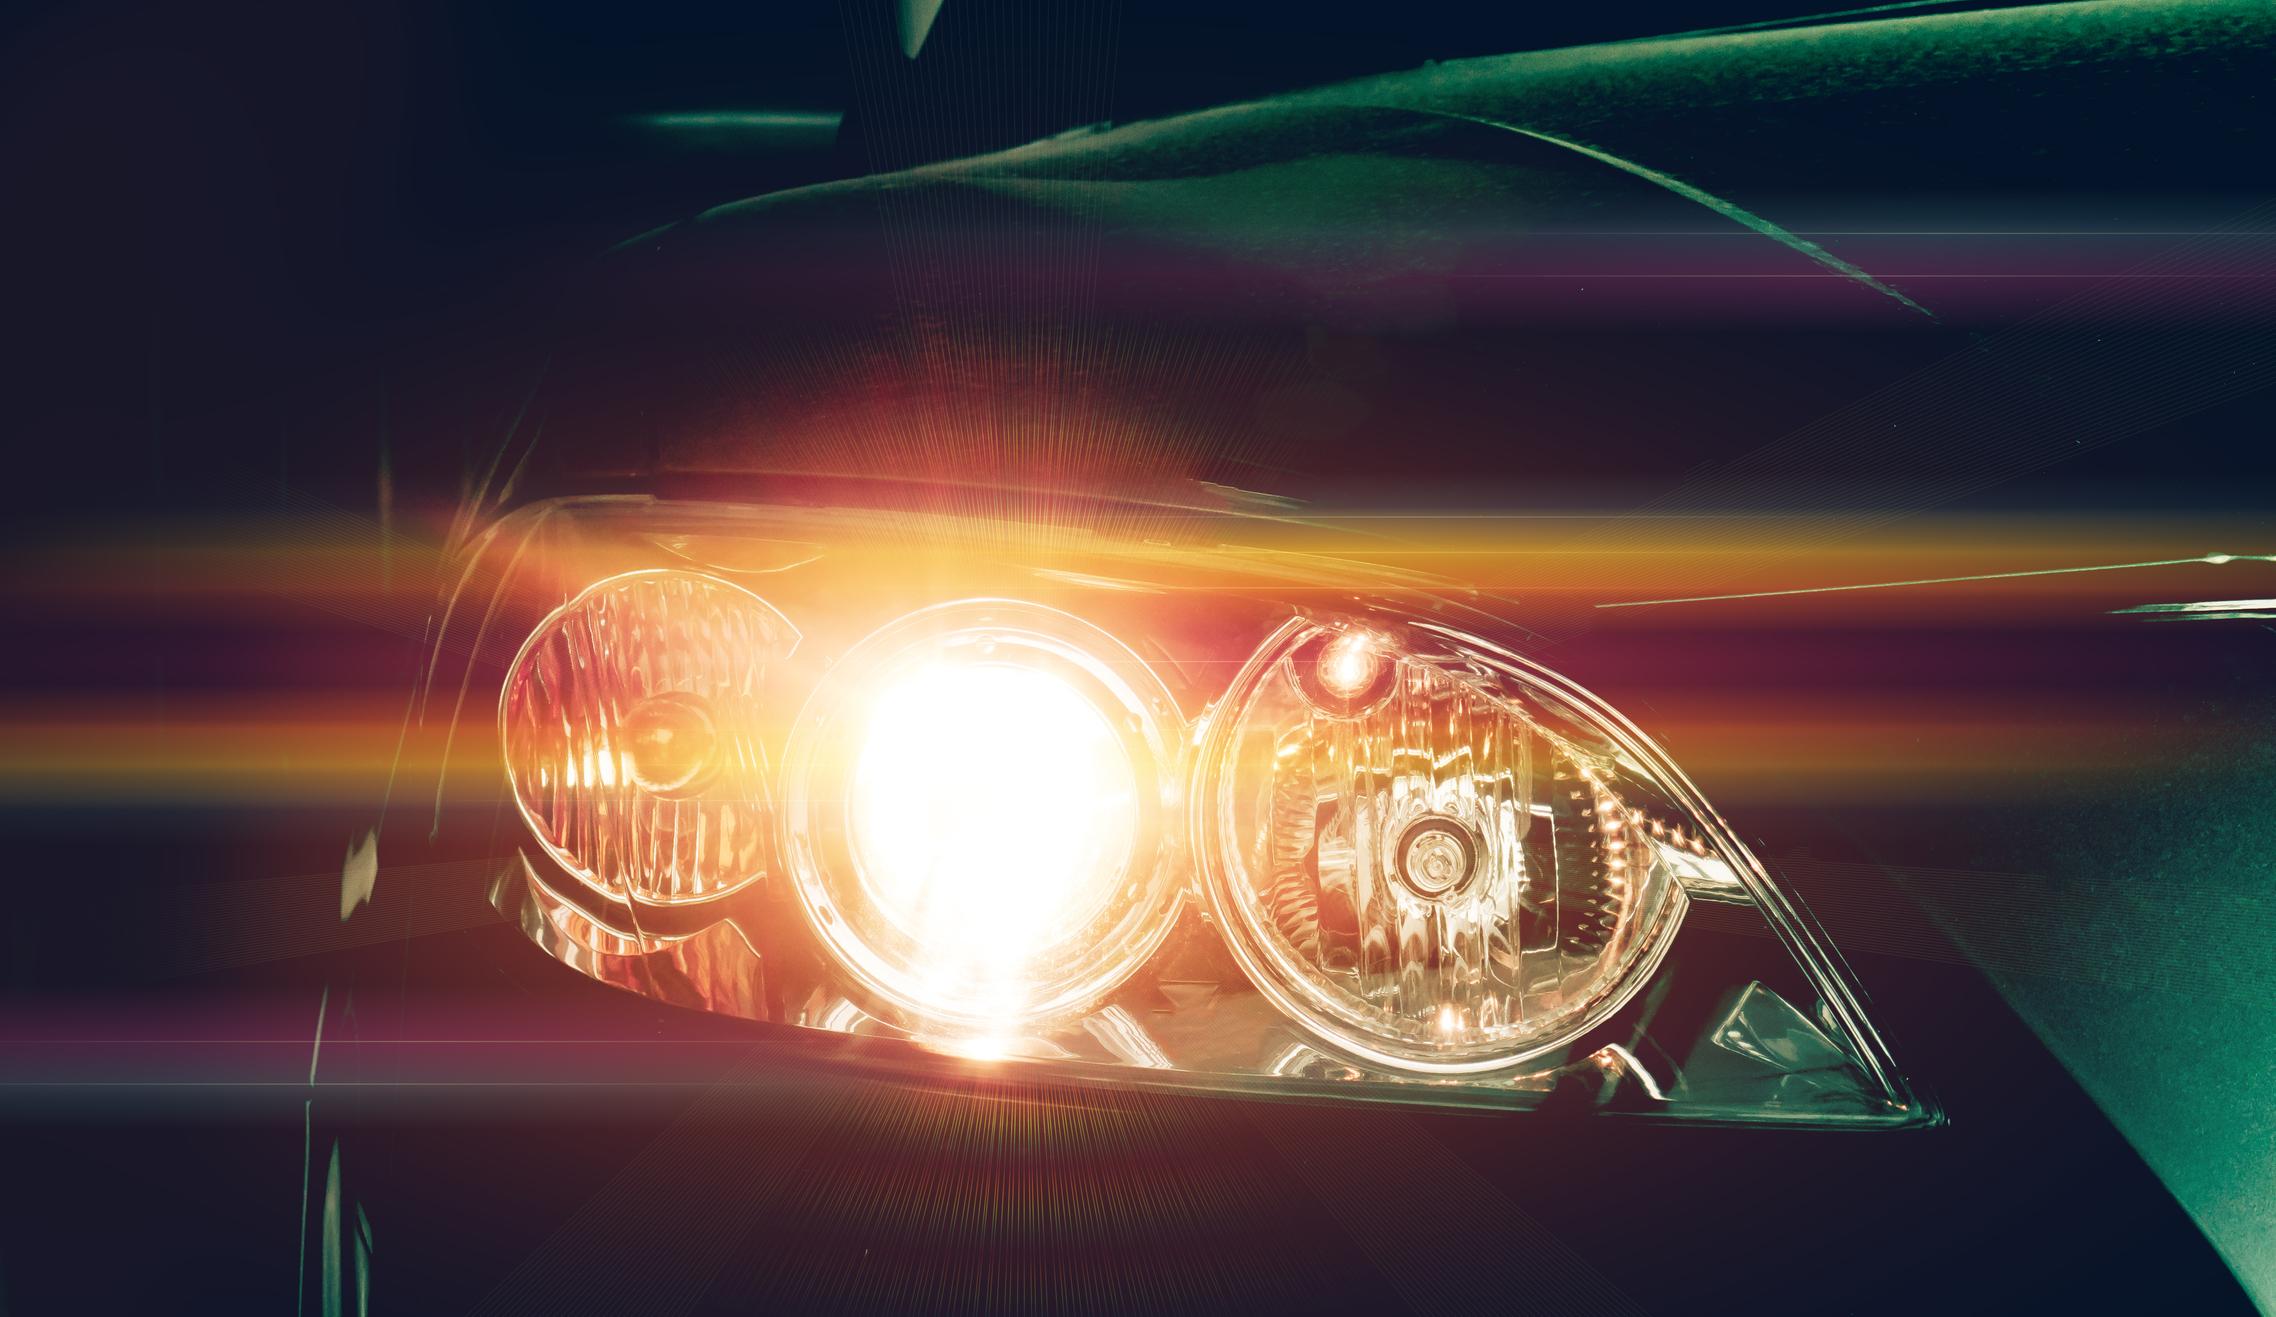 Bilens lysen